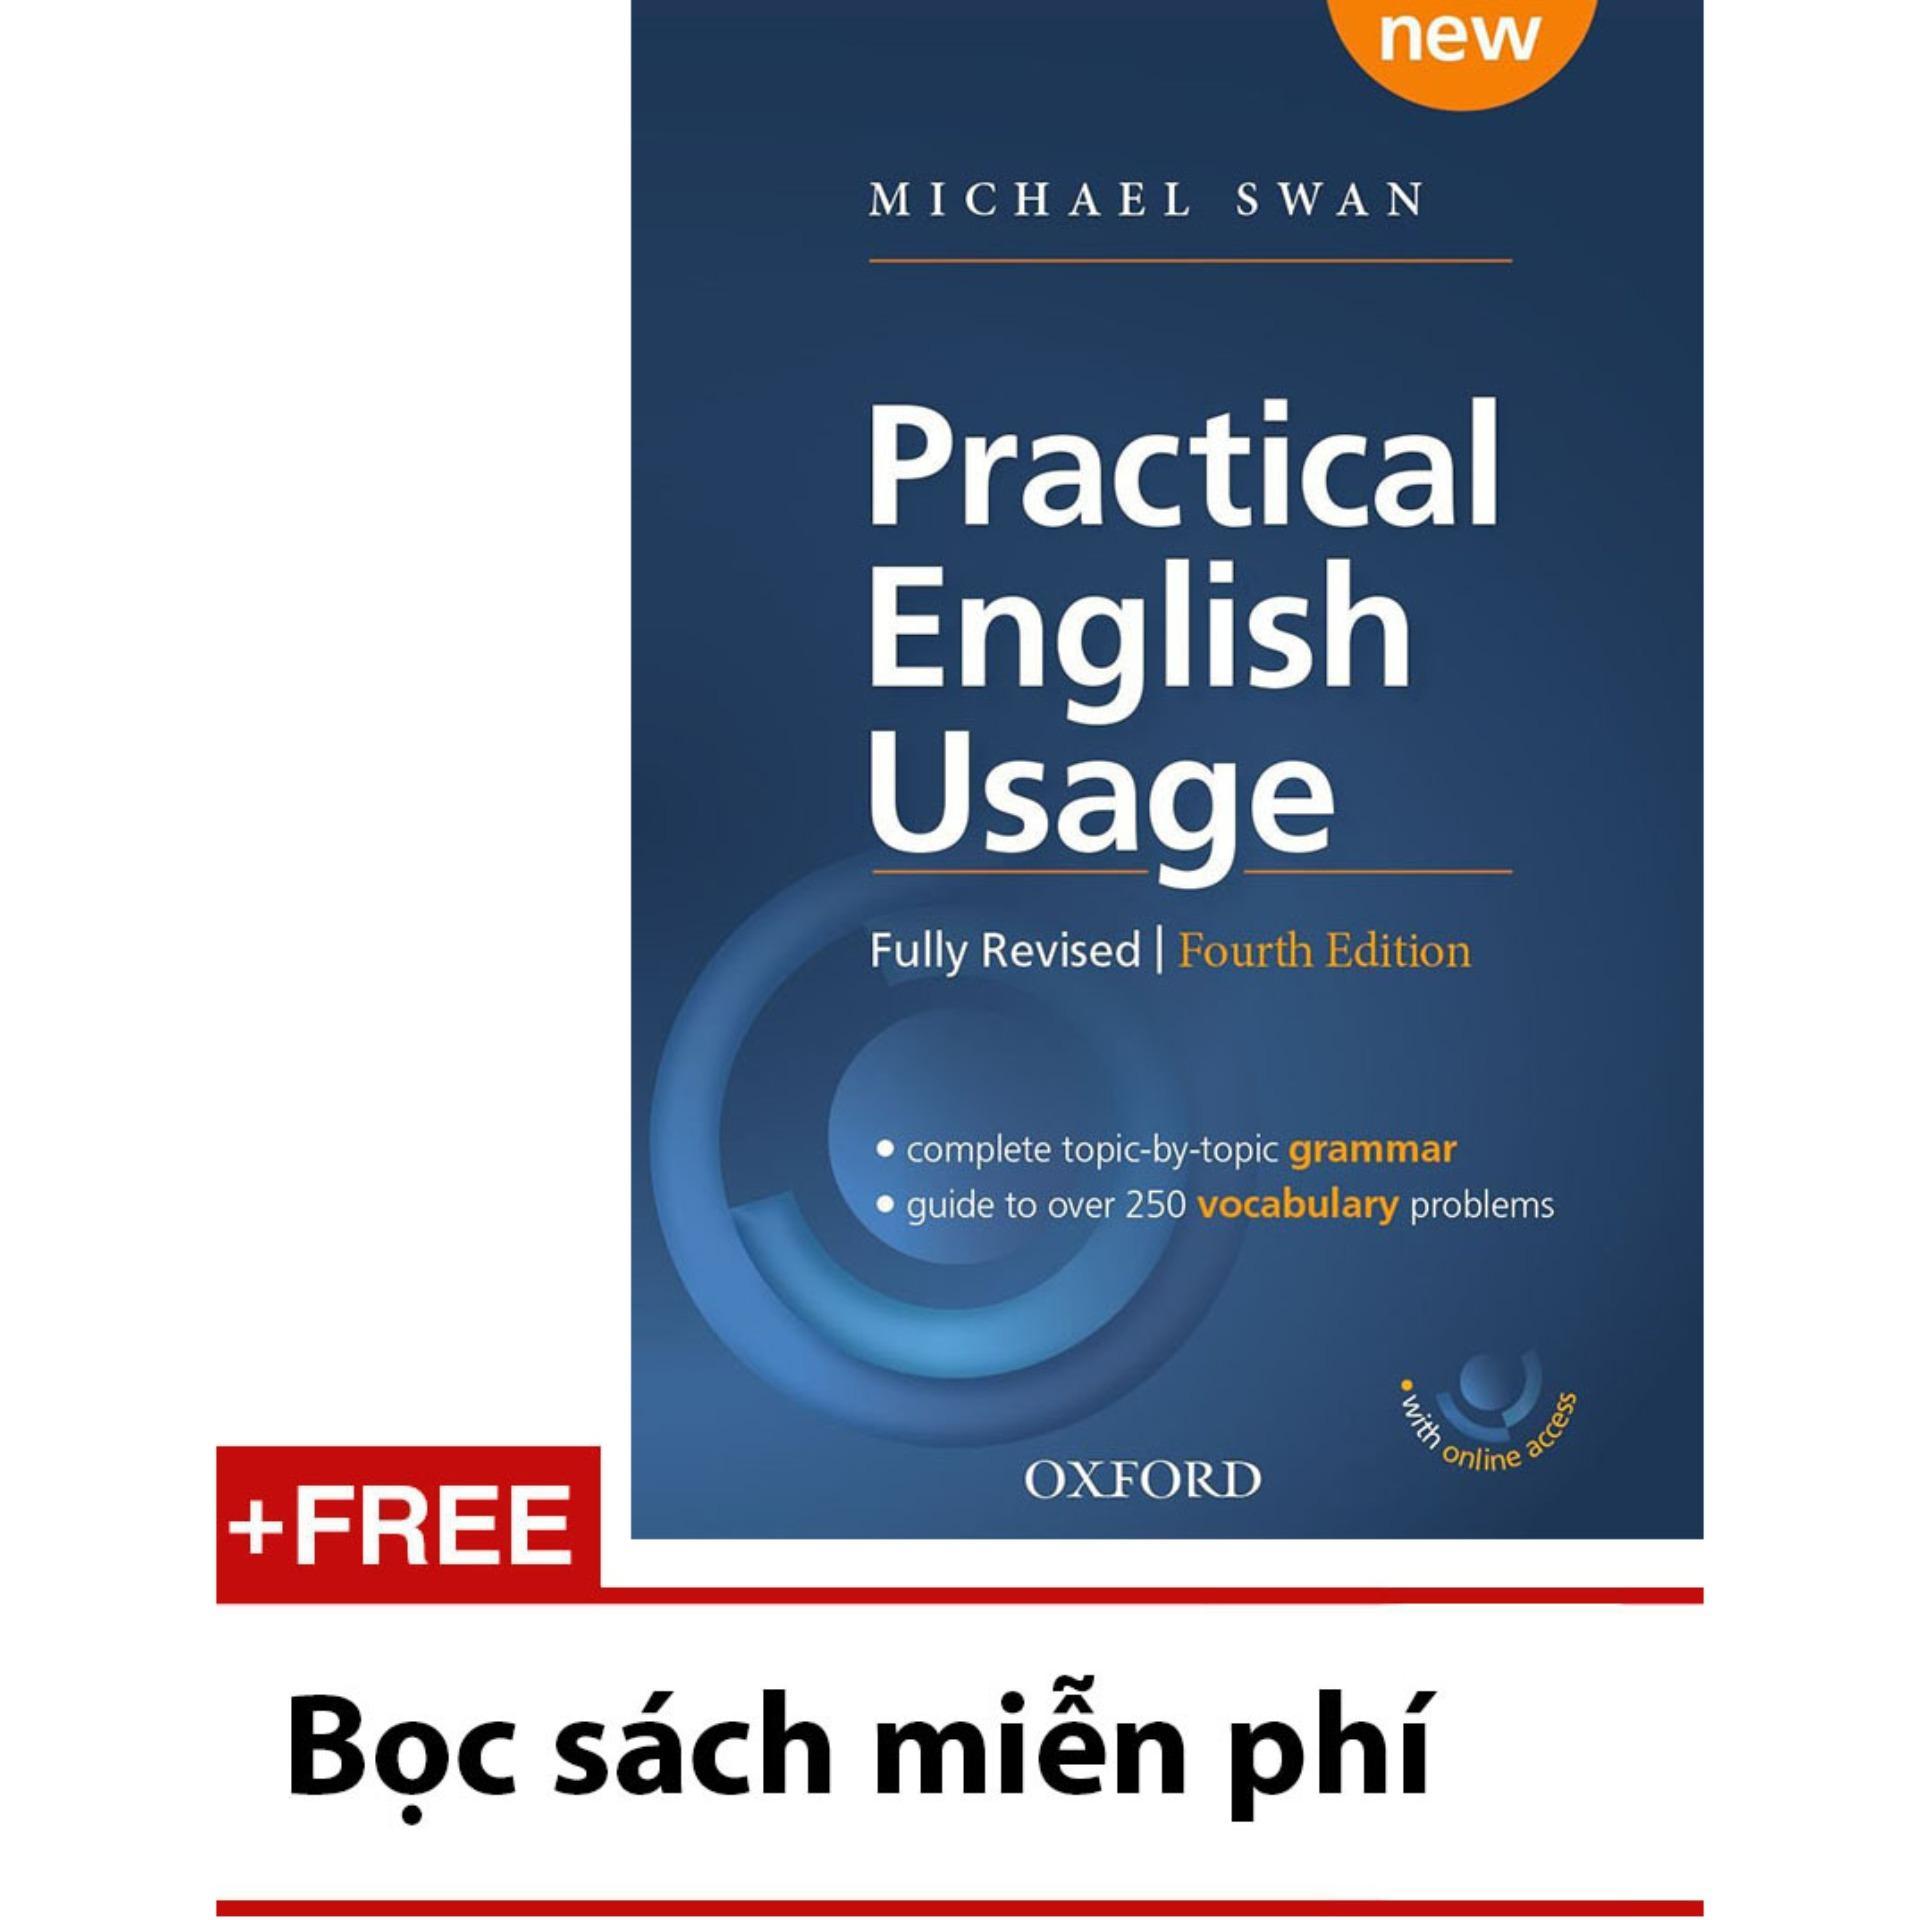 Practical English Usage - 4th edition